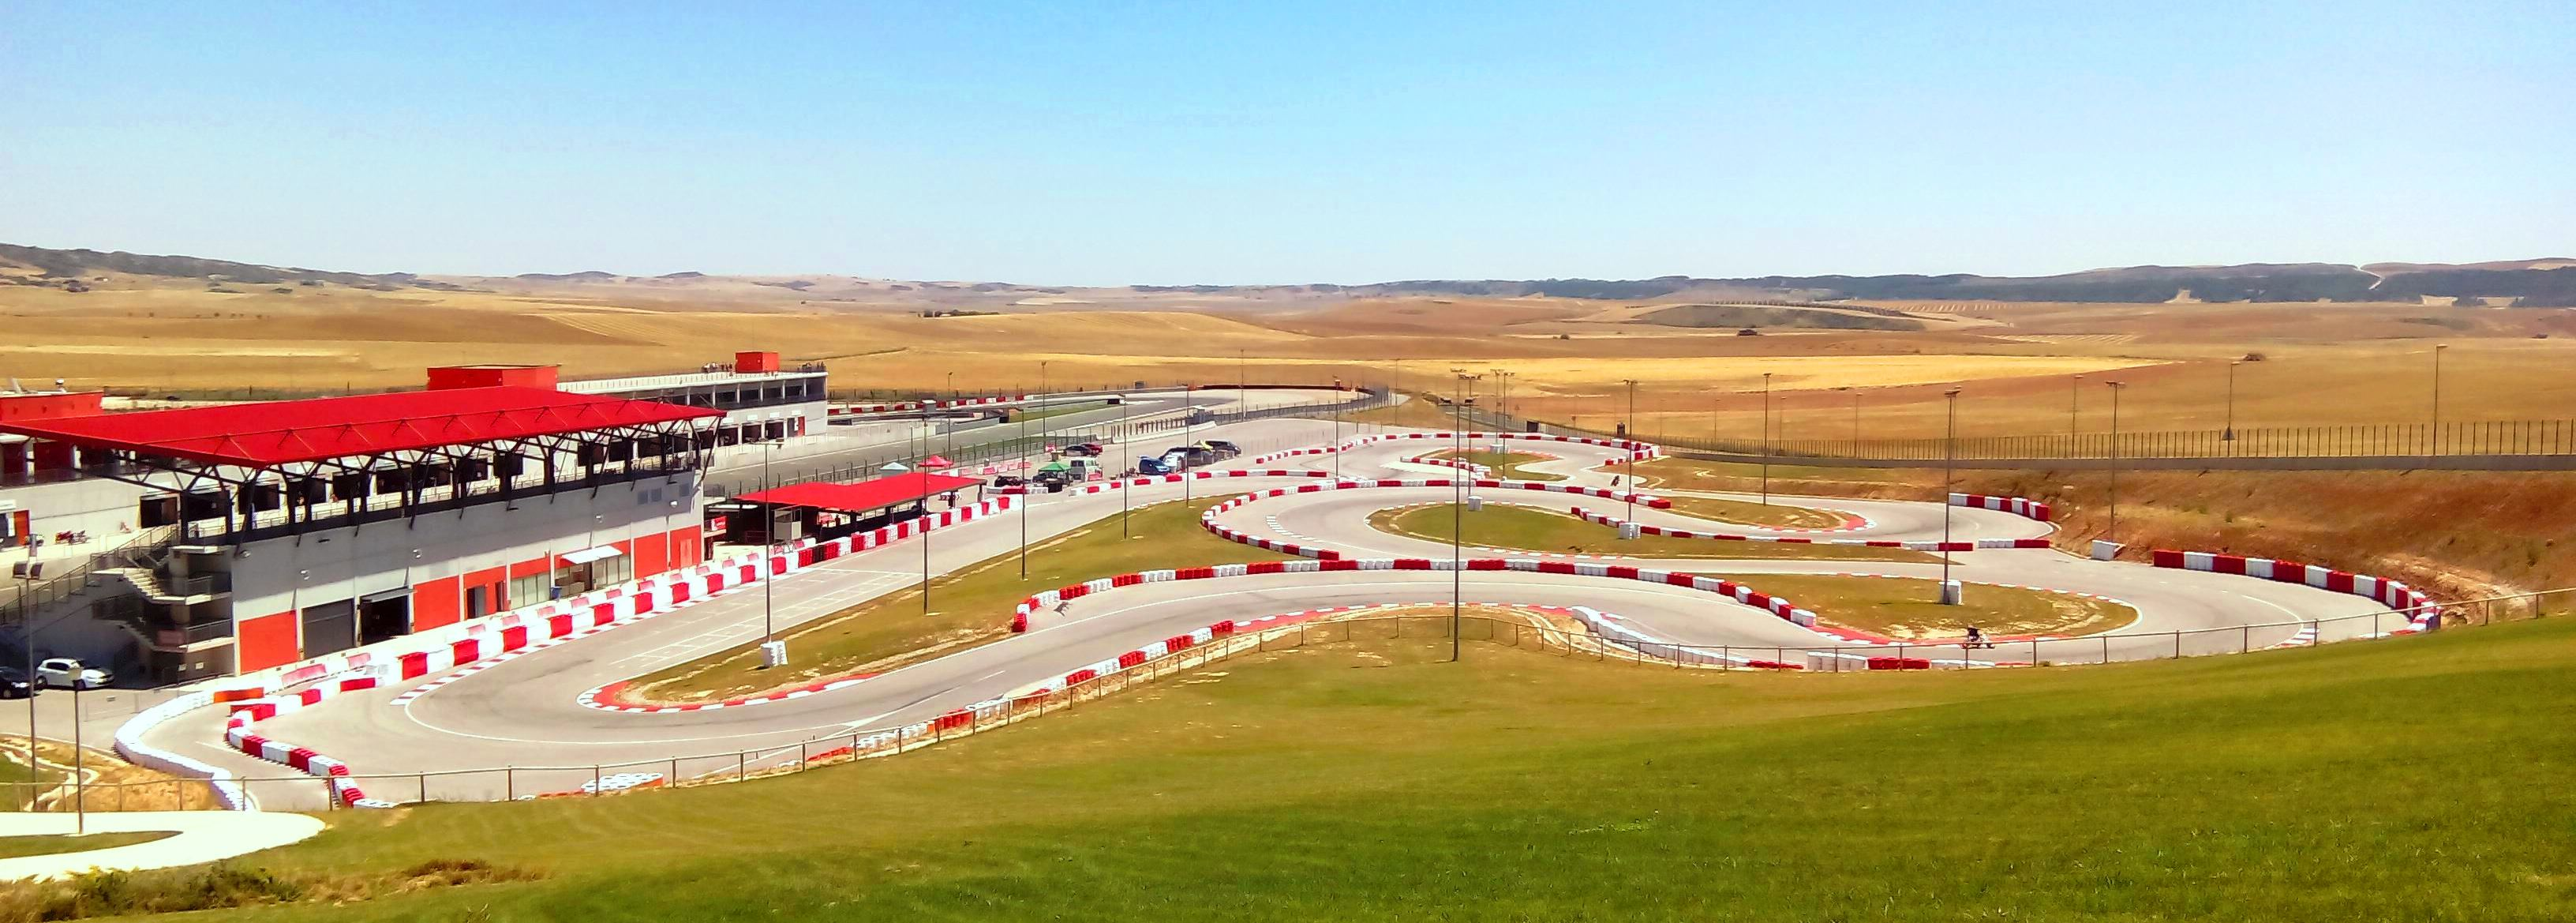 La Pista | Karting de Navarra